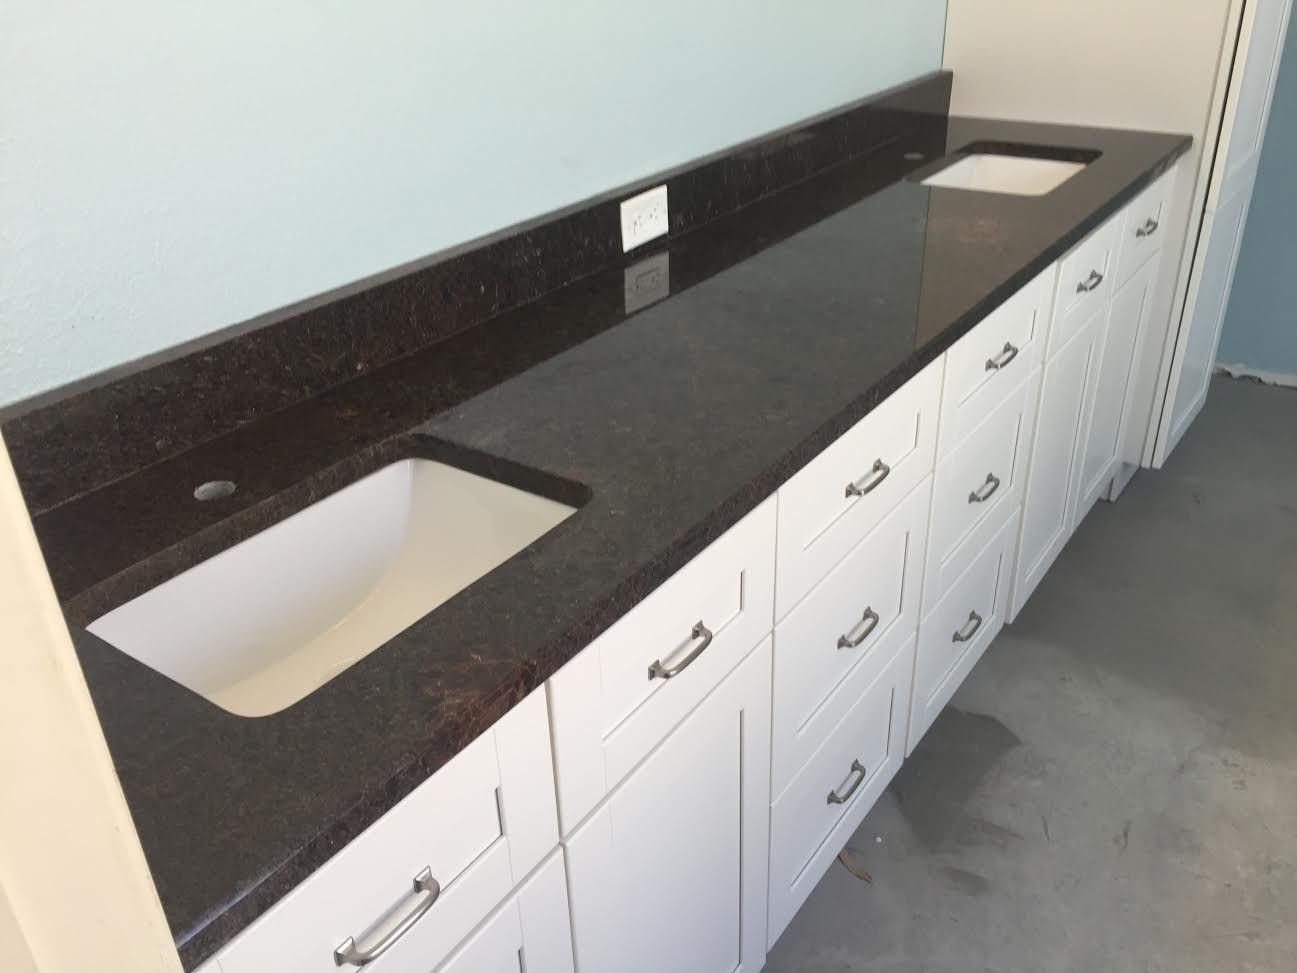 #granite #marble #nashville #countertops #granitecountertops #home#remodel  #quartz